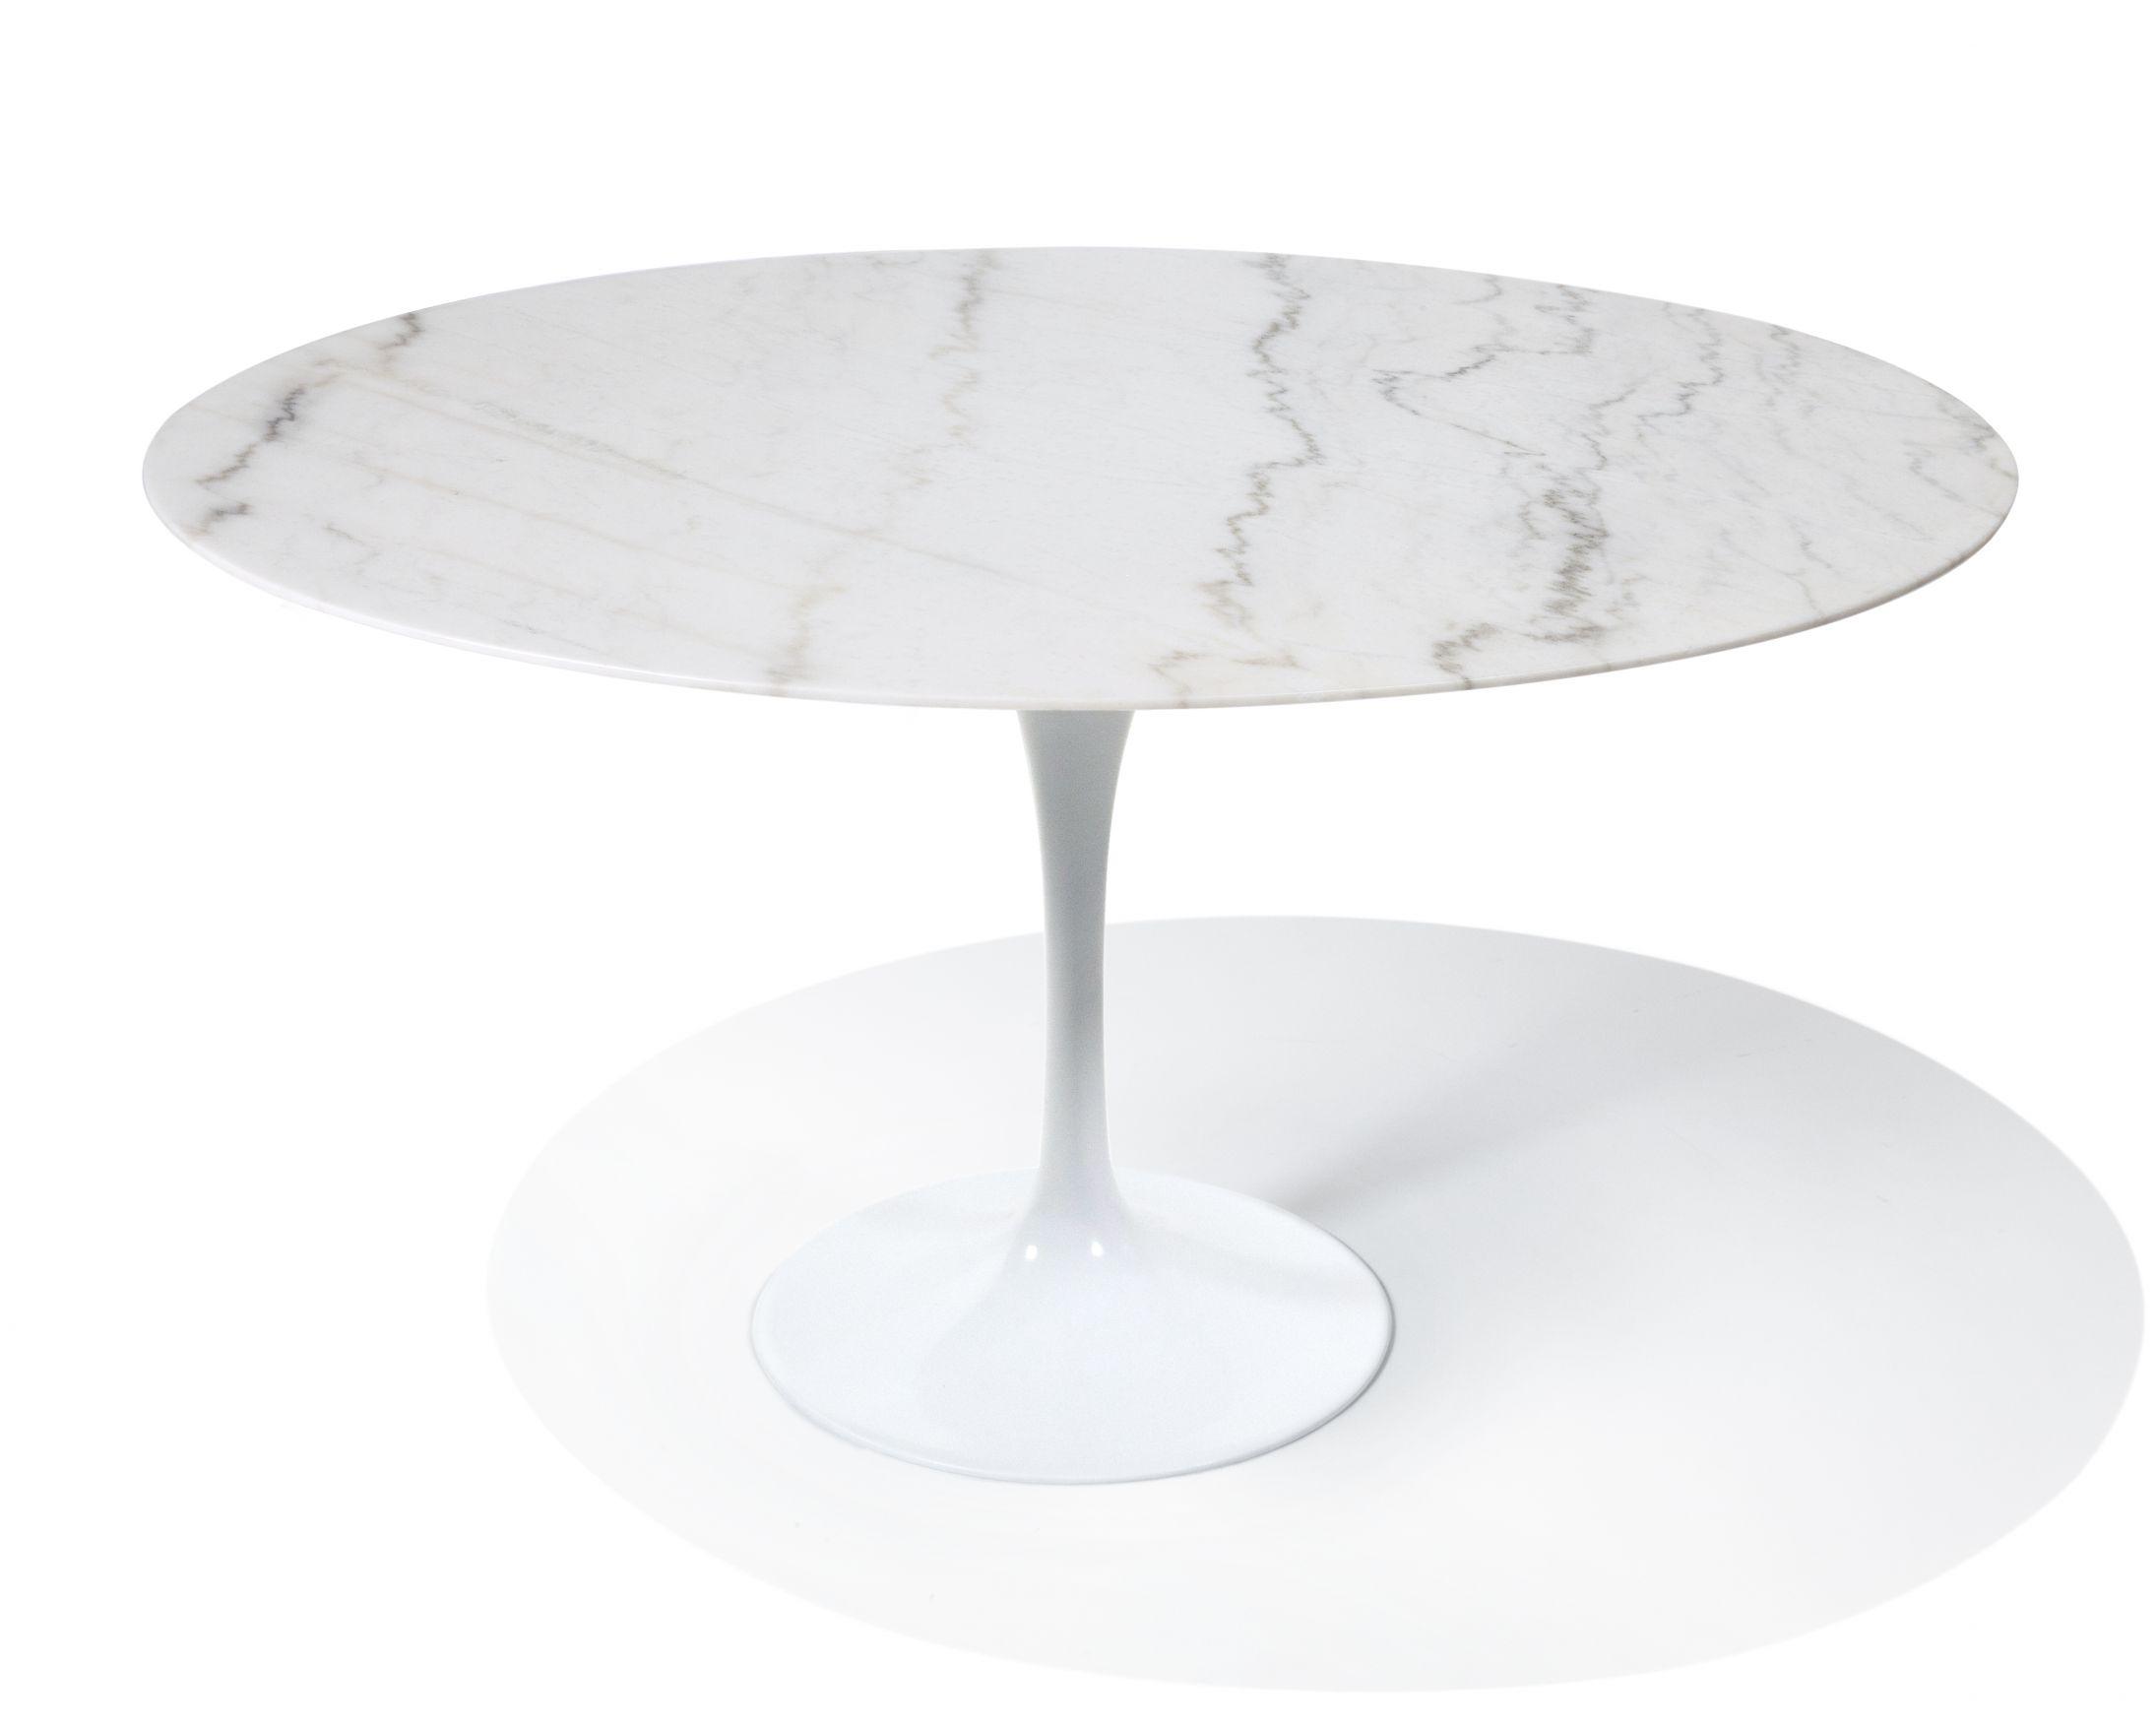 Tulip Dining Table-Calacatta Gold Marble_0.jpg